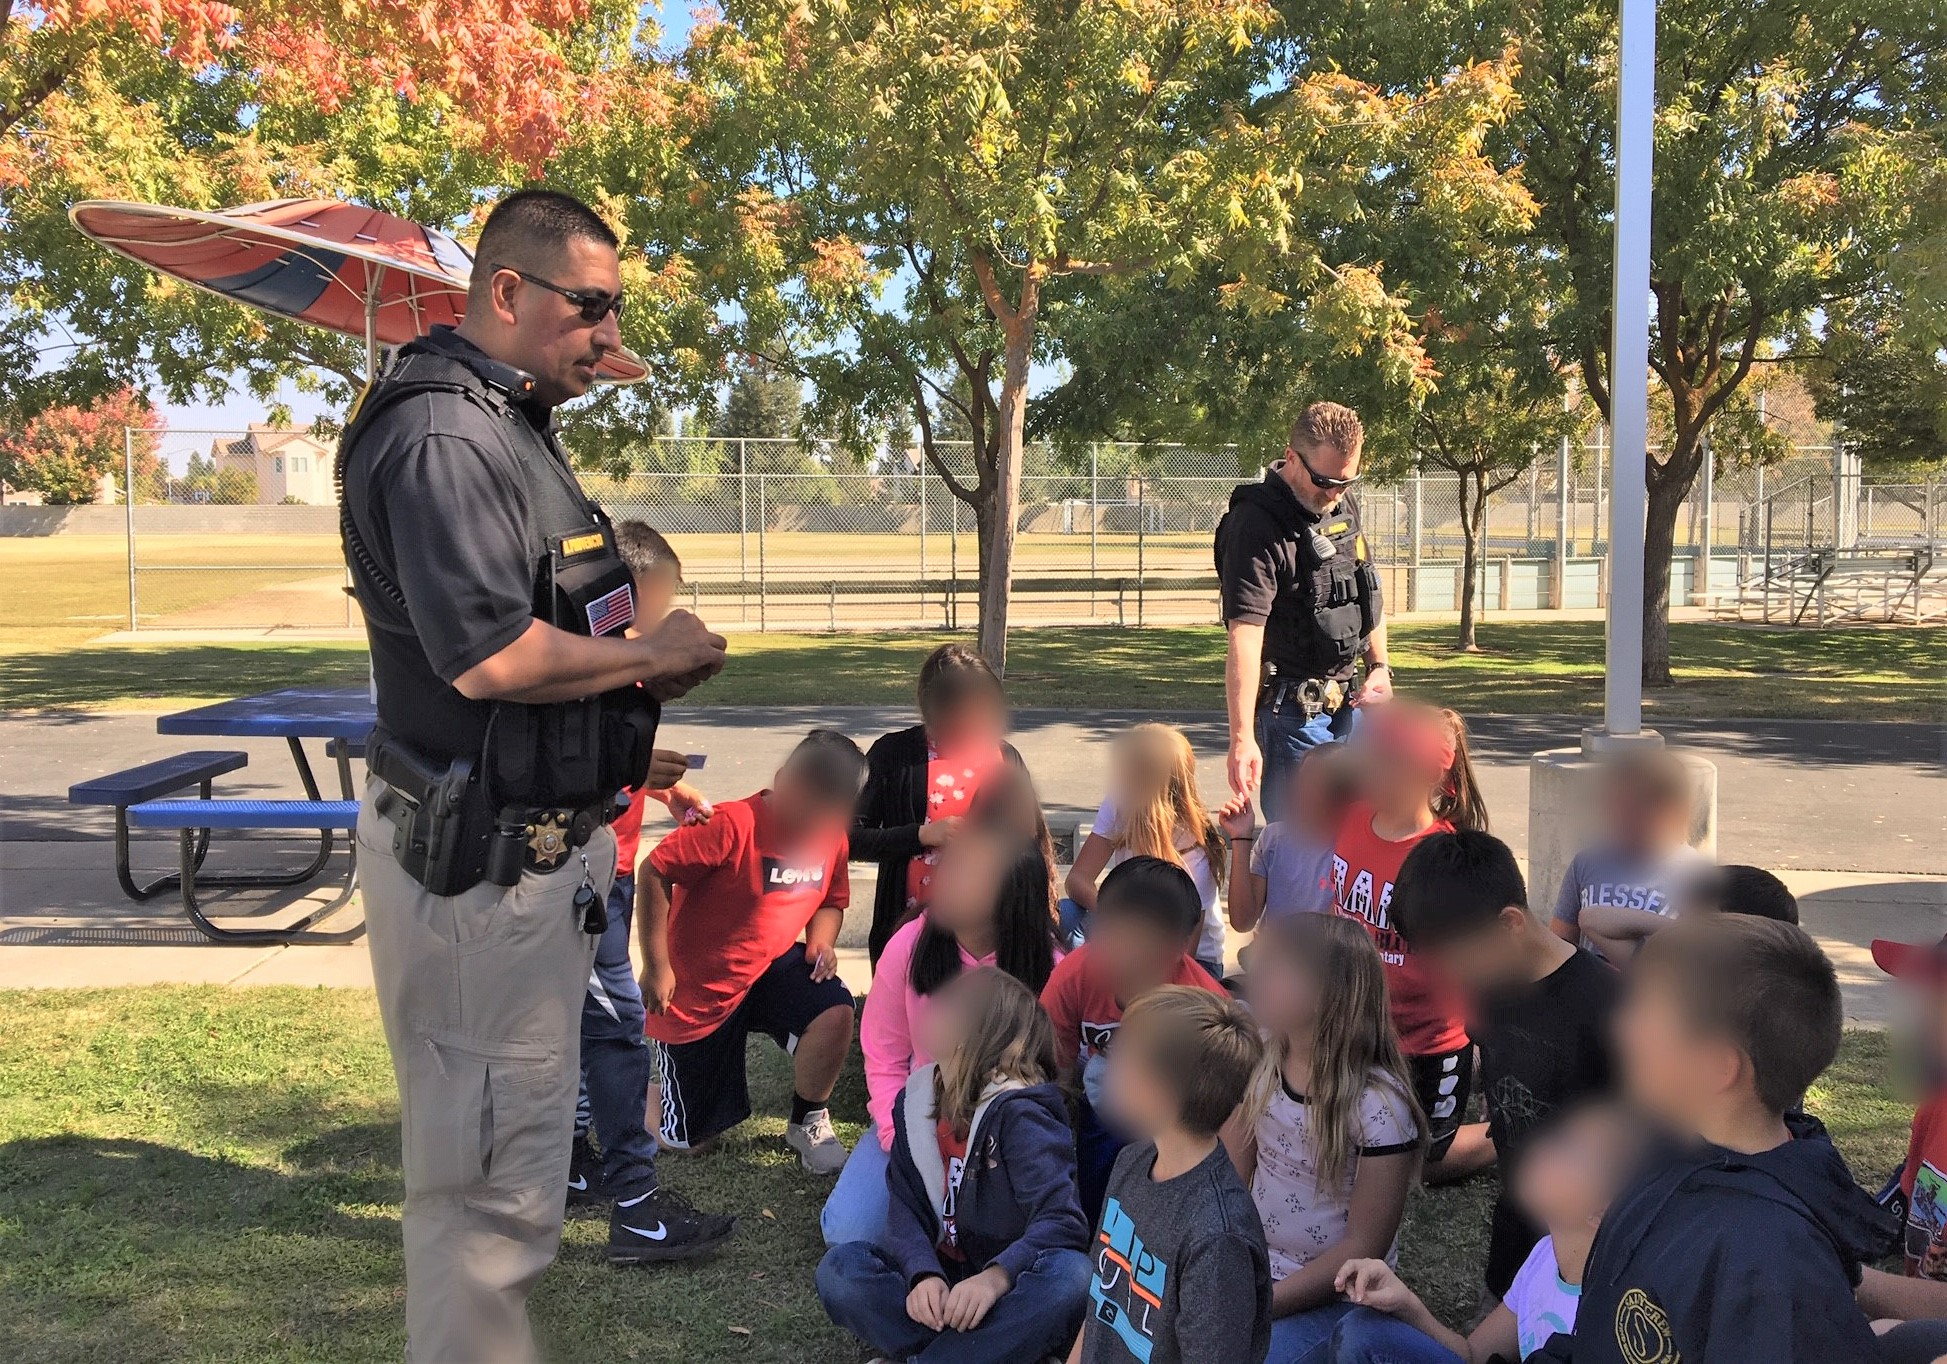 Men in uniforms talk to kids.